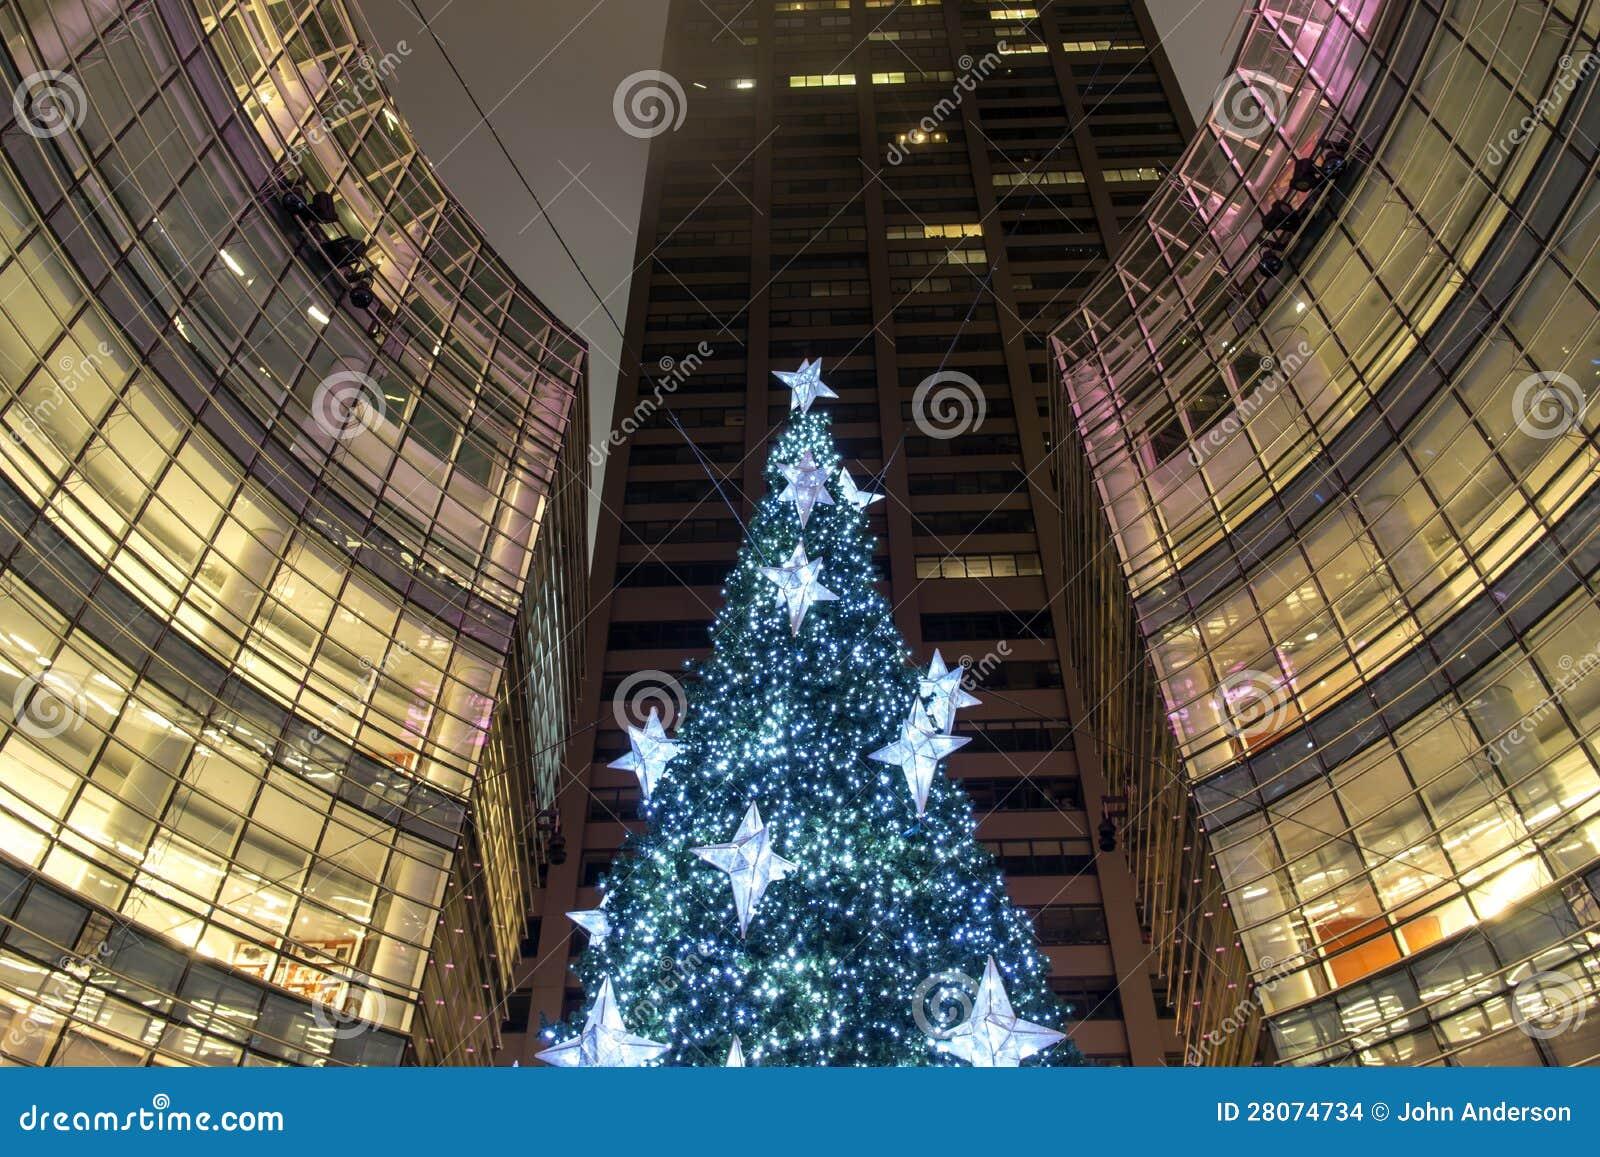 new york city manhattan christmas tree